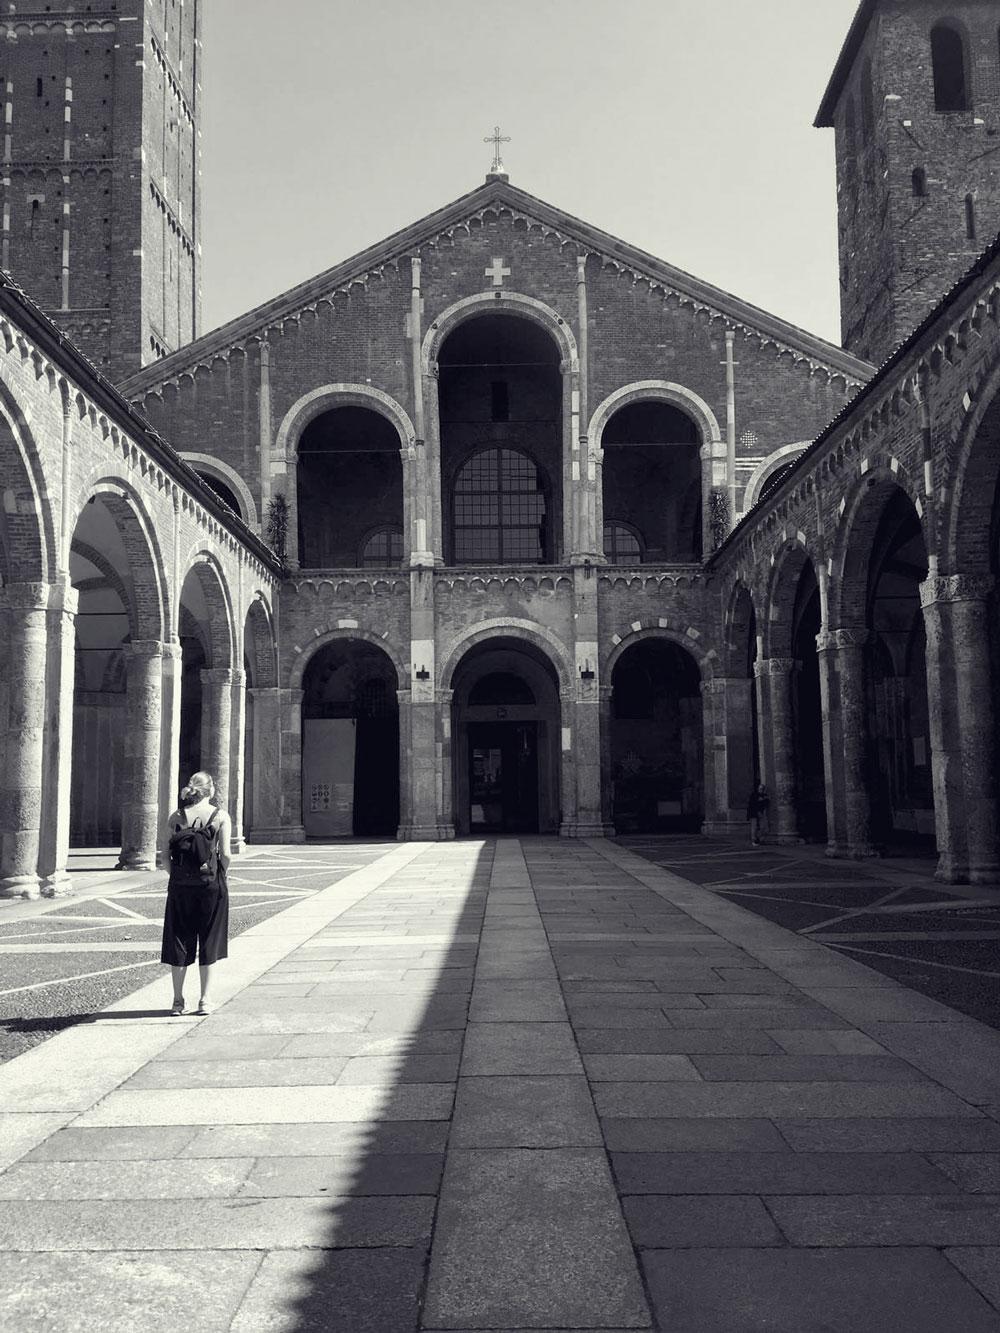 BADI-Culture-Milano-Leonie-02.jpg